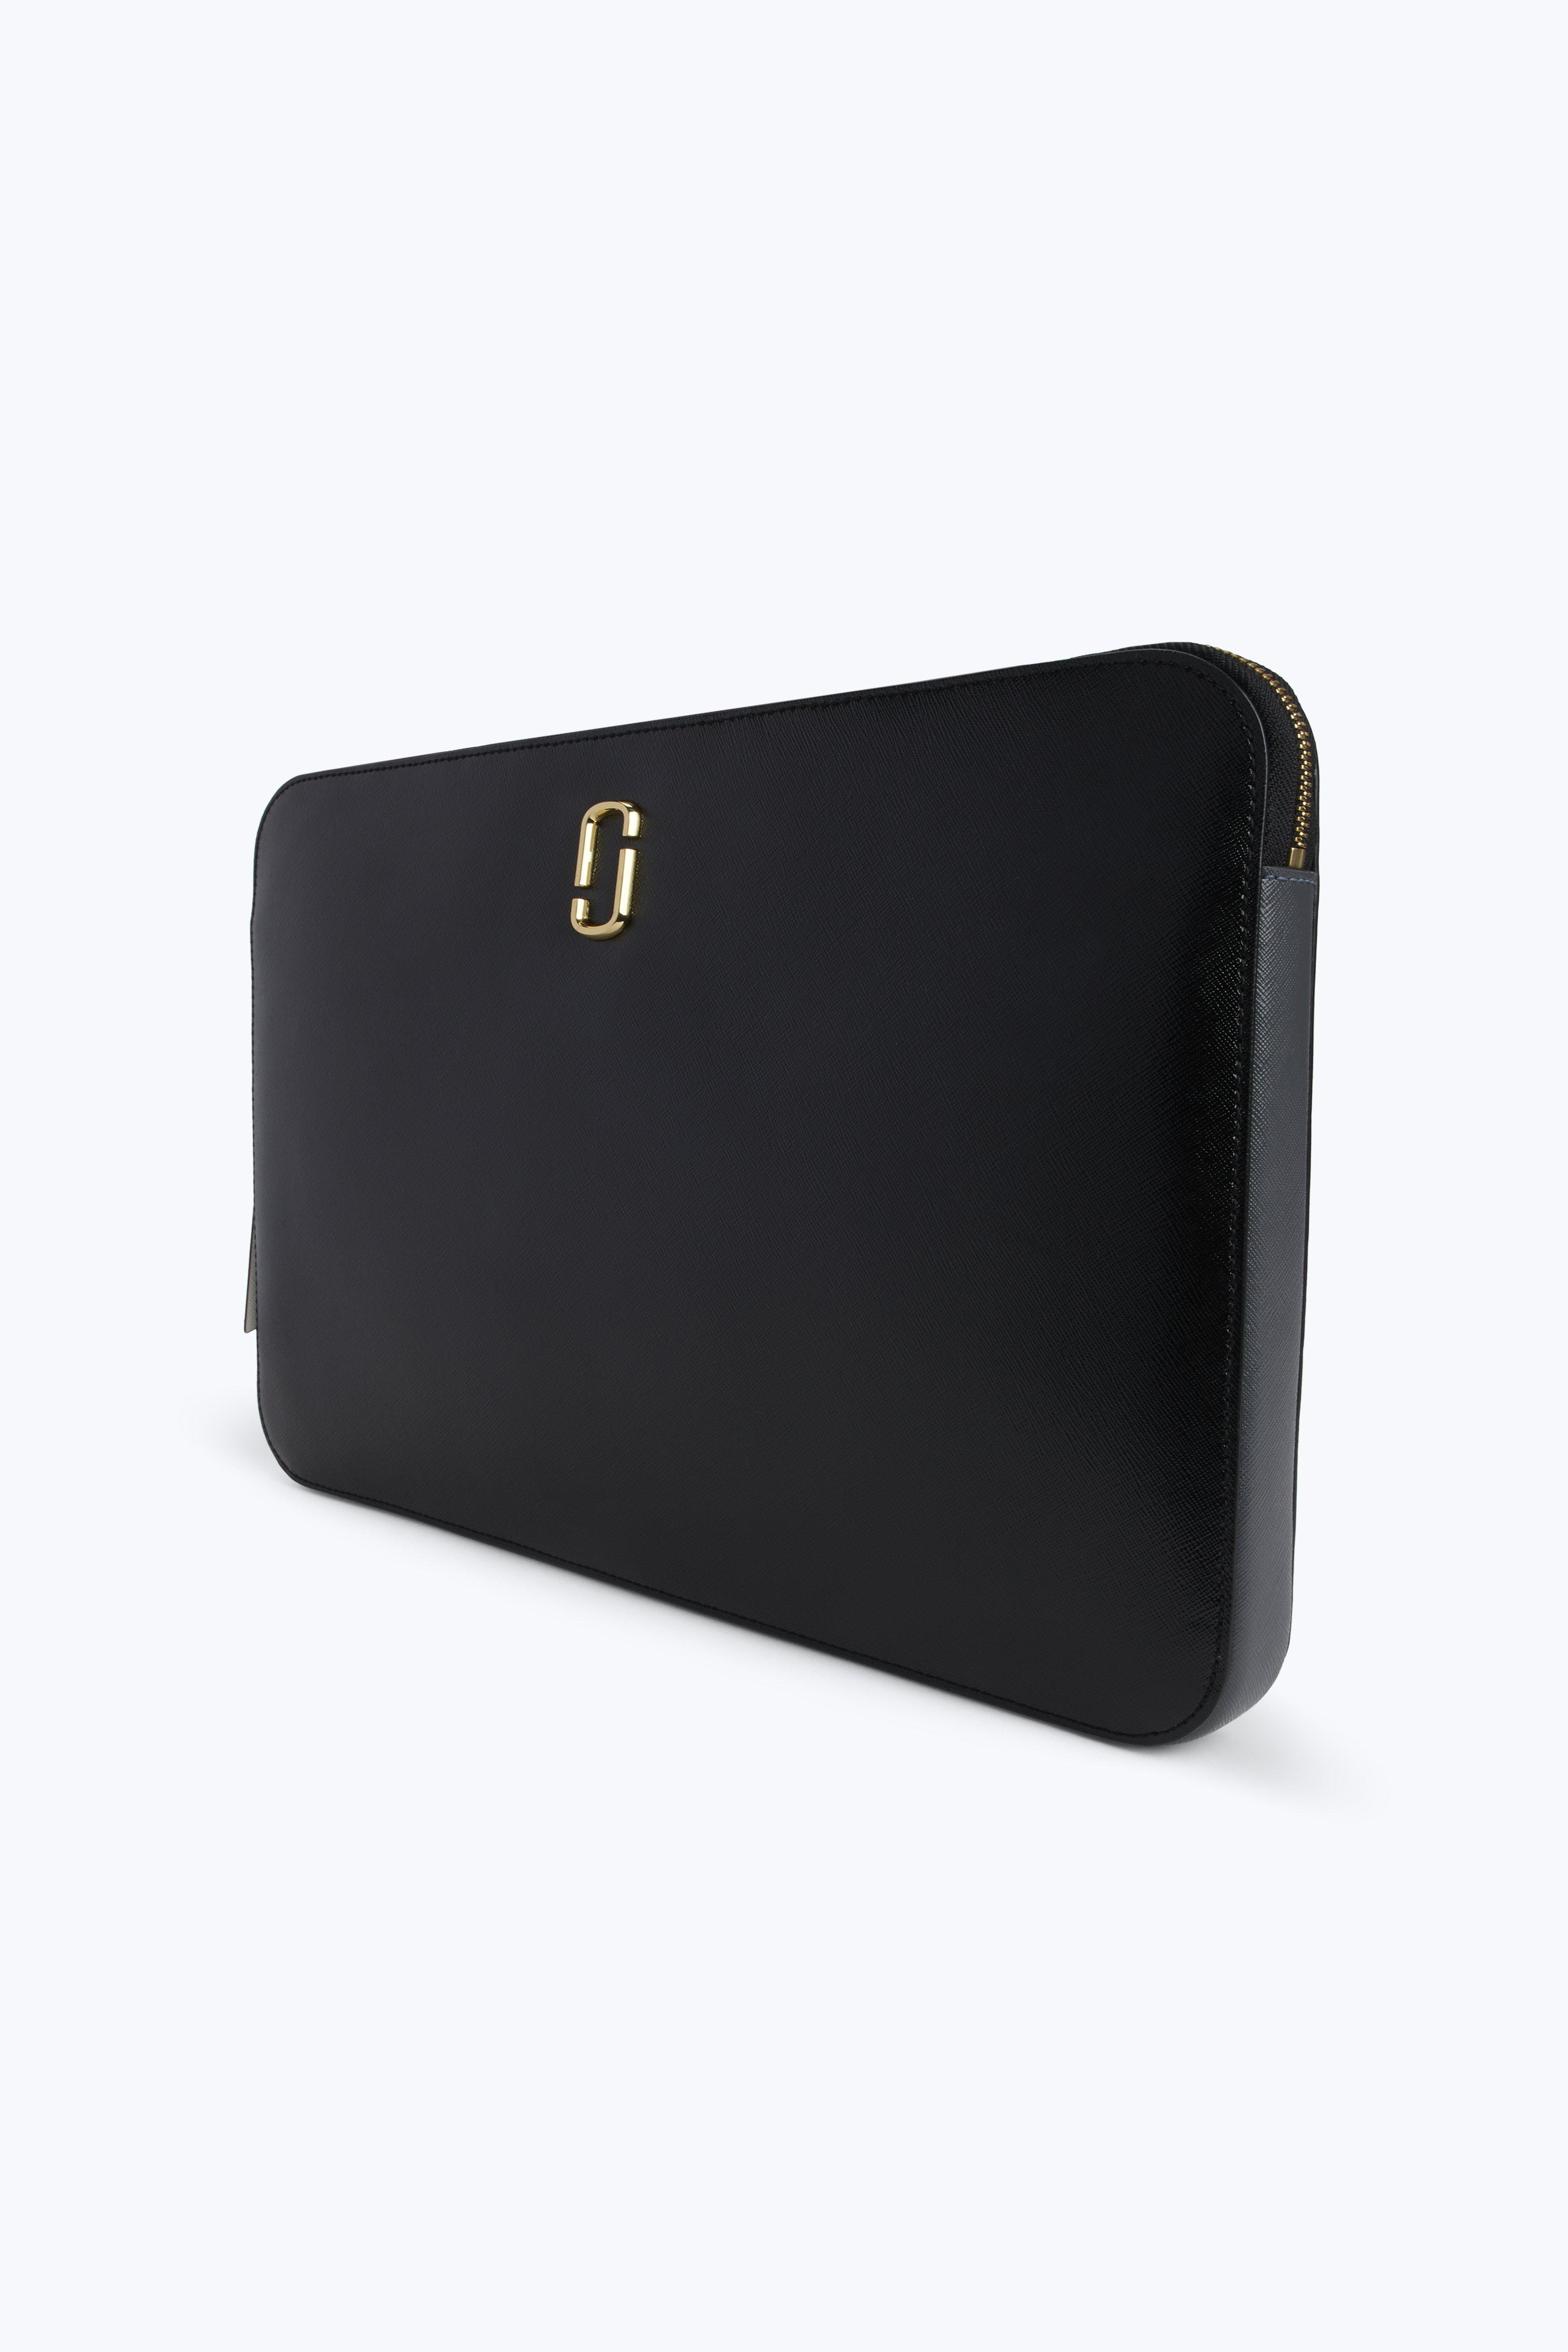 marc jacobs fodral laptop